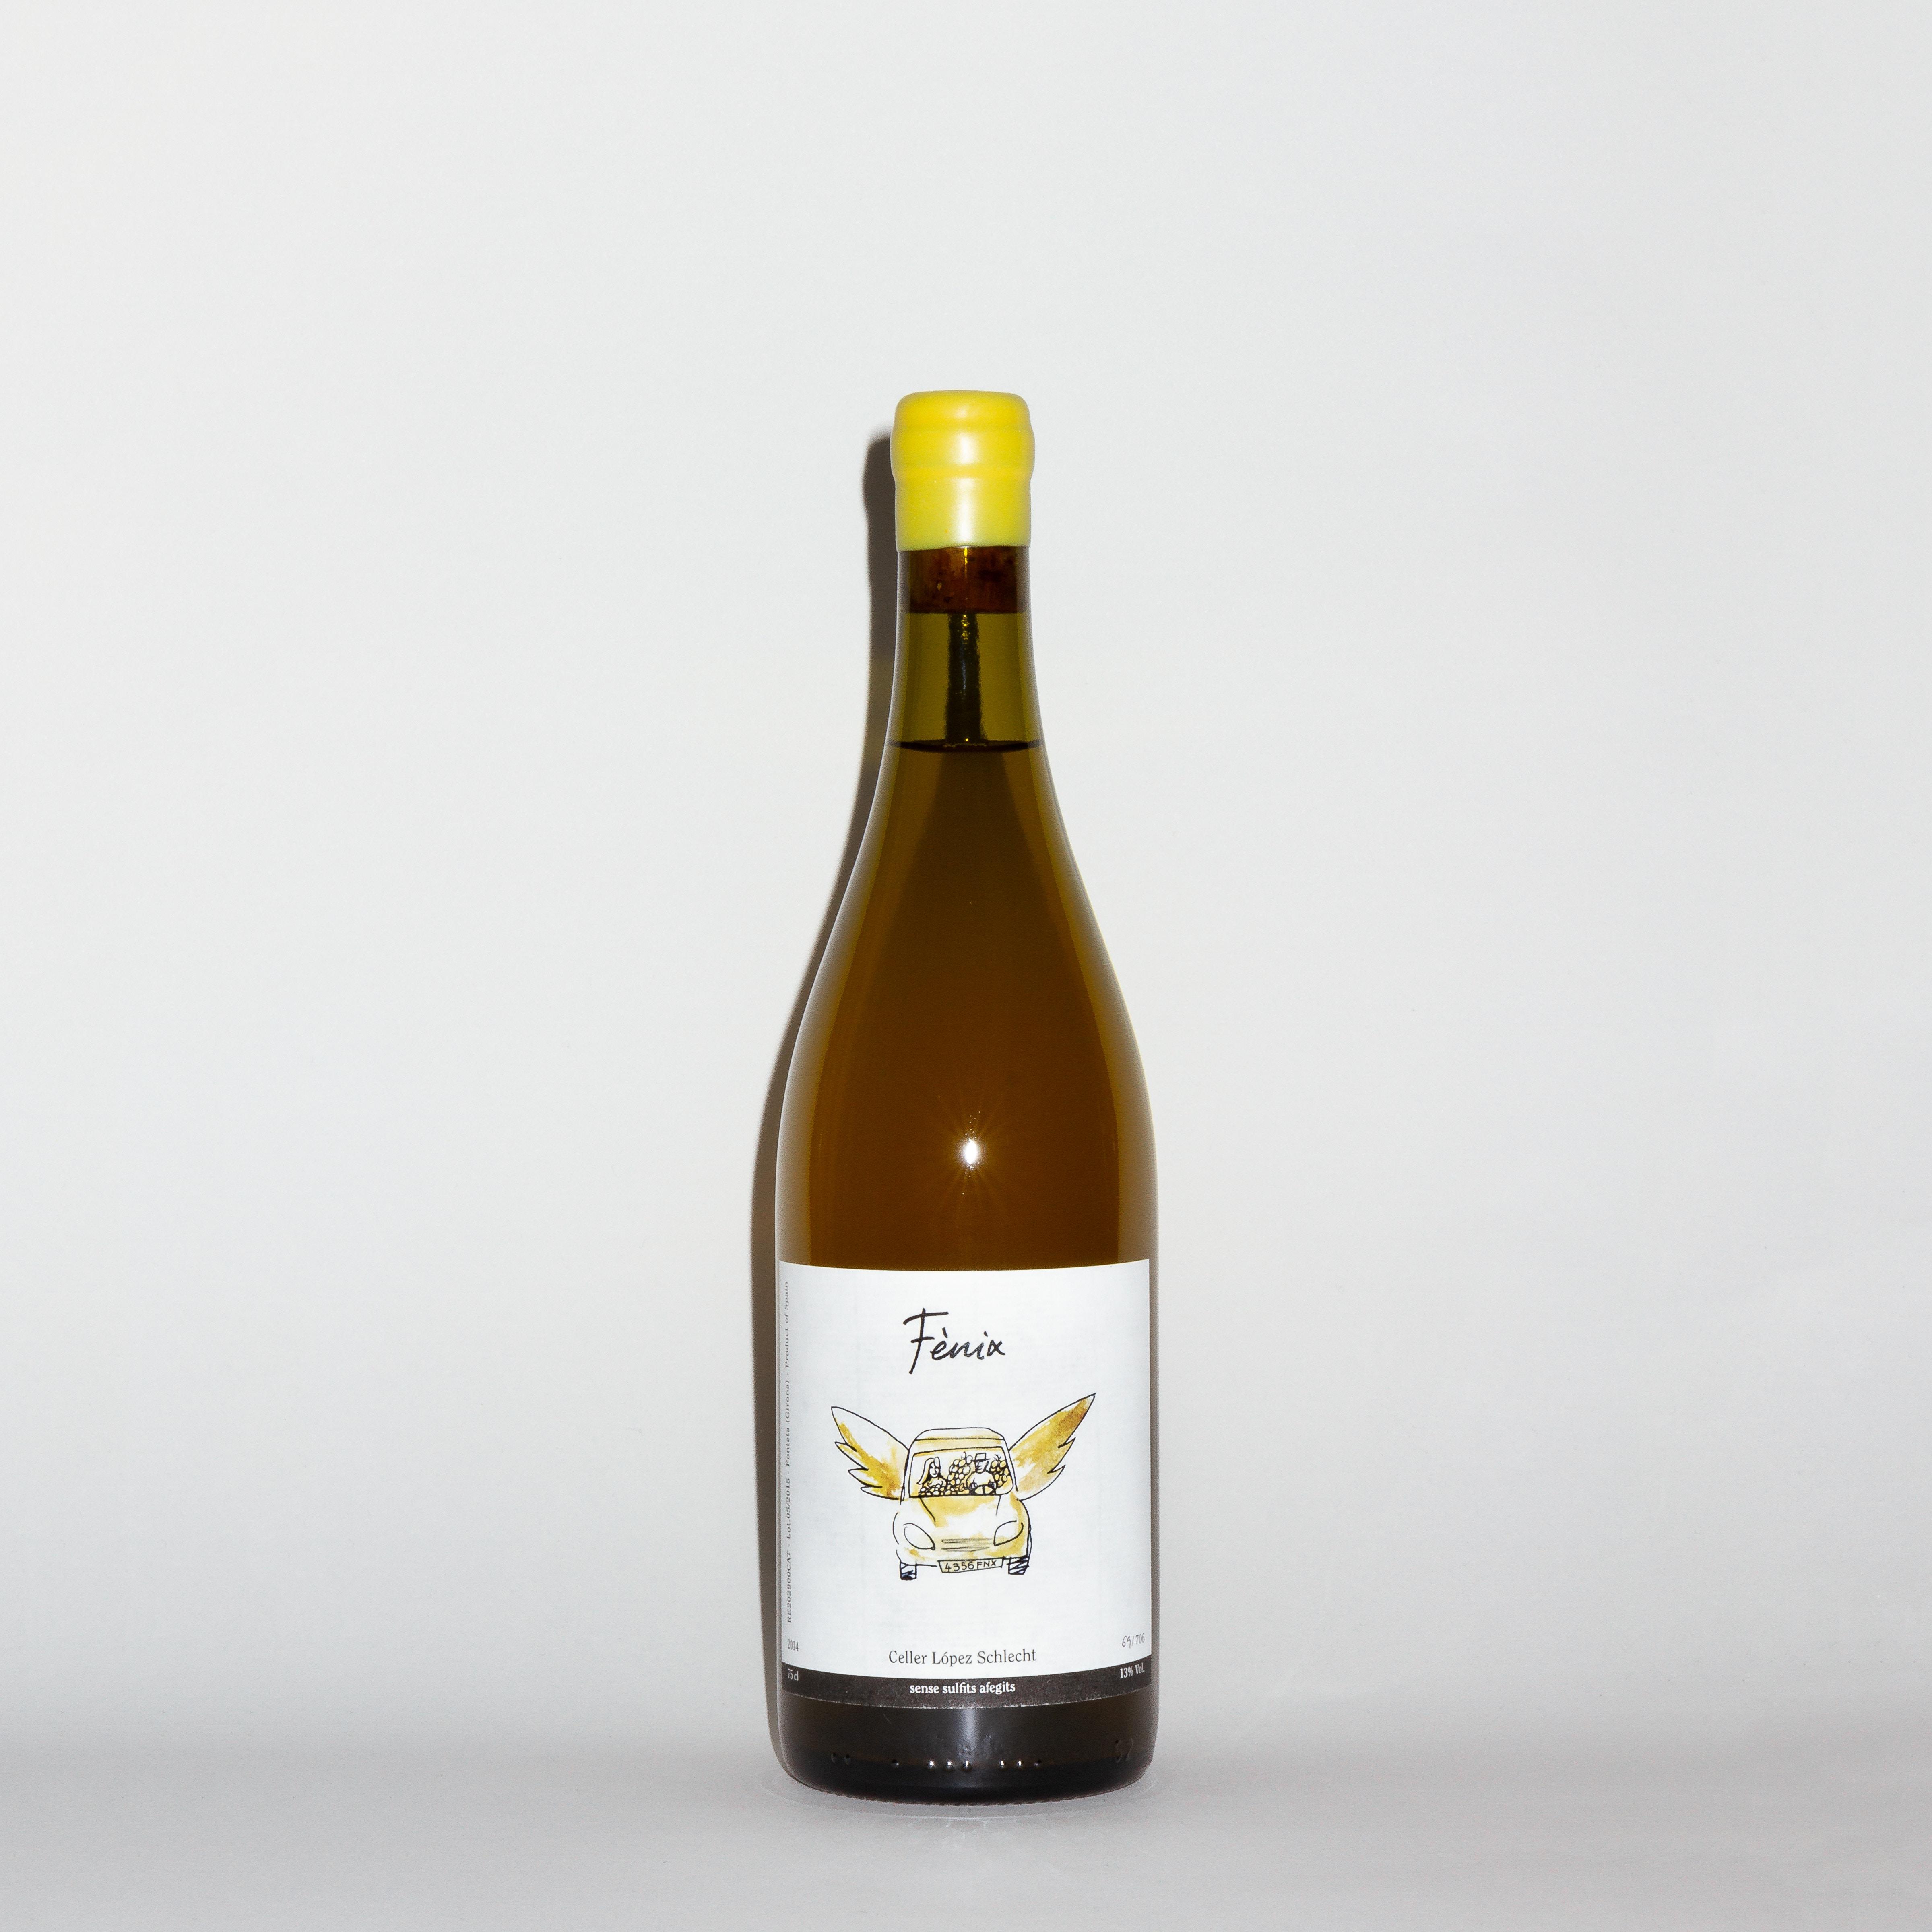 Fenix 2014 by Celler López Schlecht